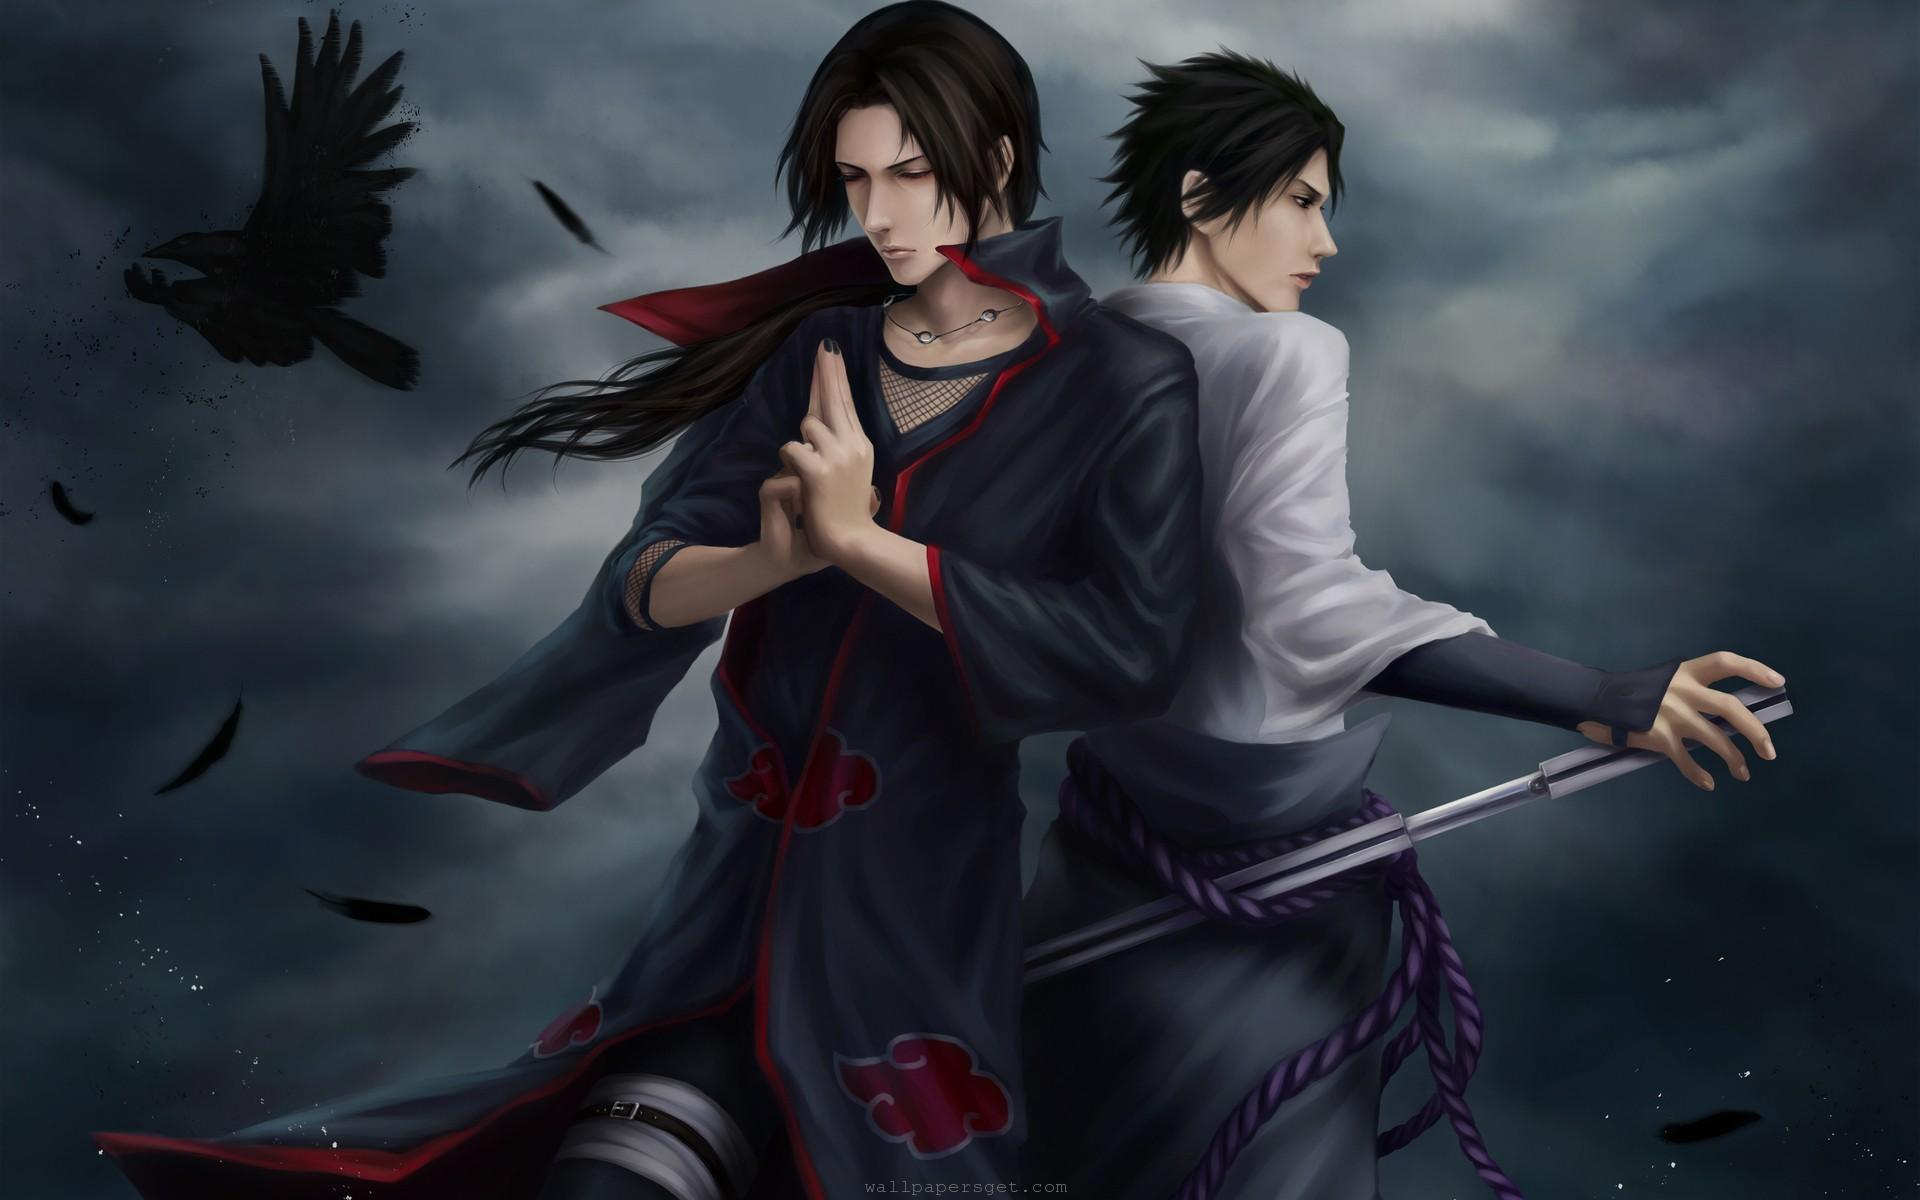 Unduh 4700 Wallpaper Naruto Terbaik Hd HD Gratid